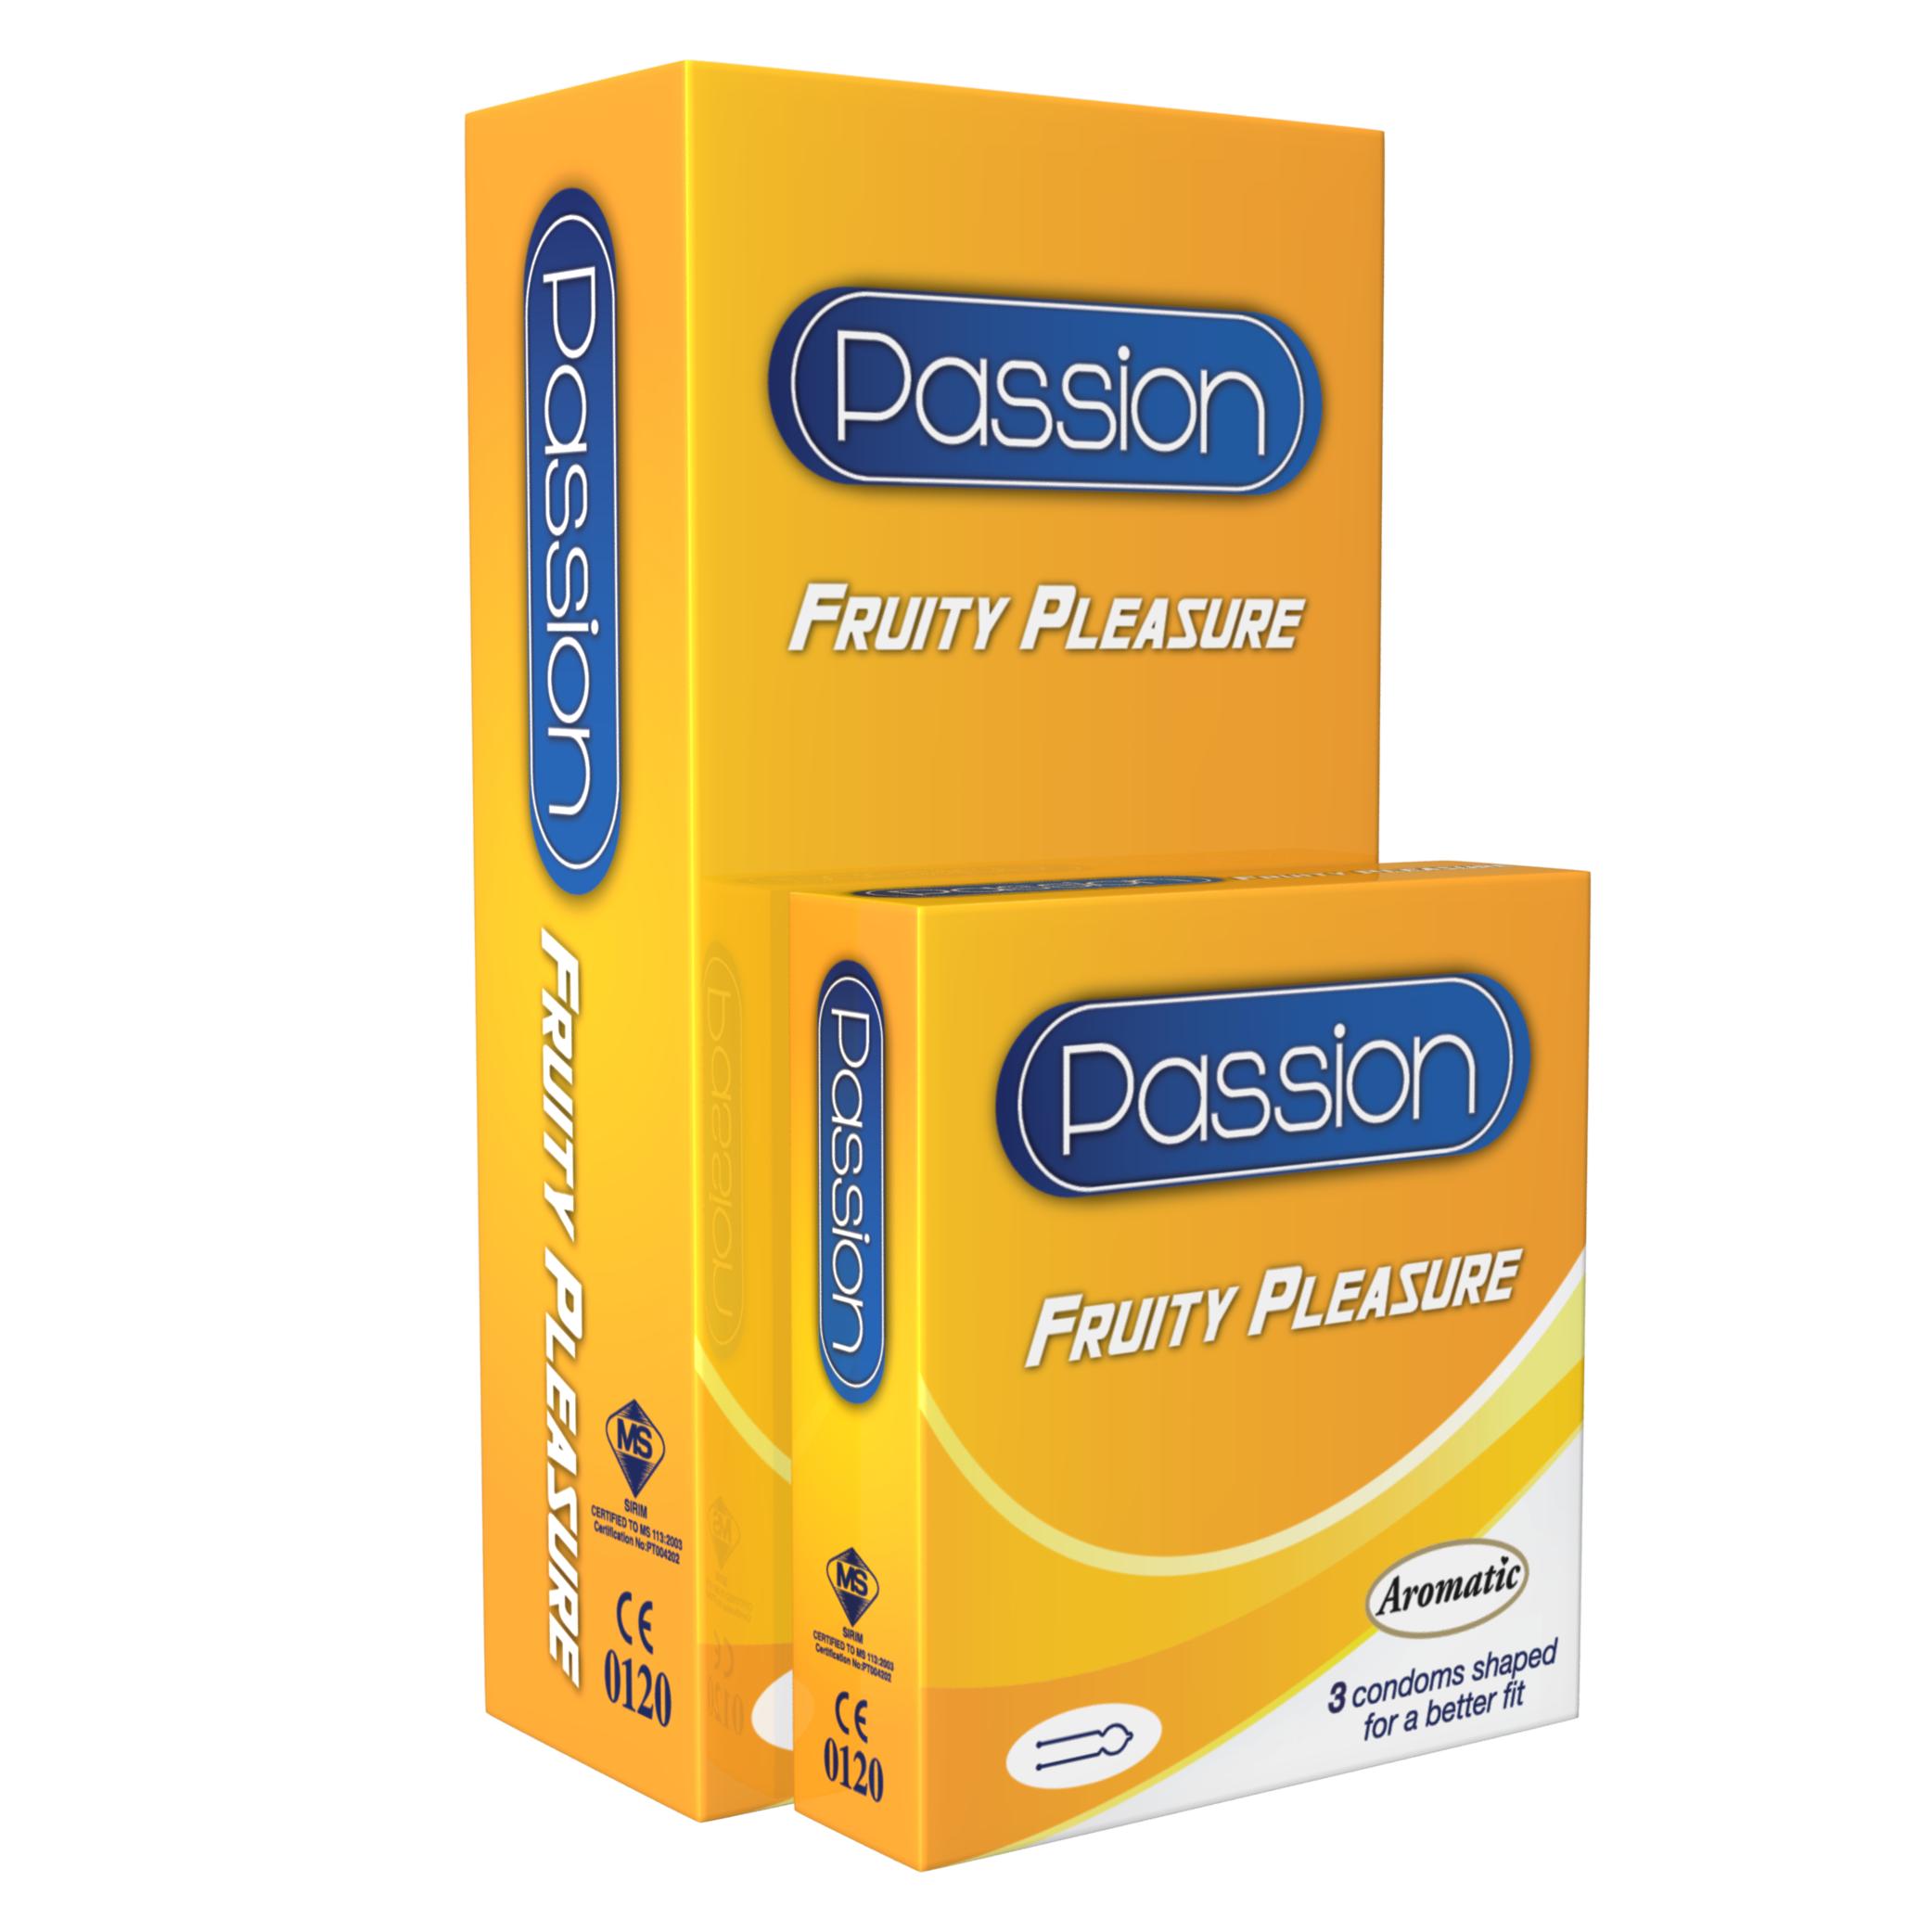 passion_aromatic_fruity_pleasure_2Counts_01